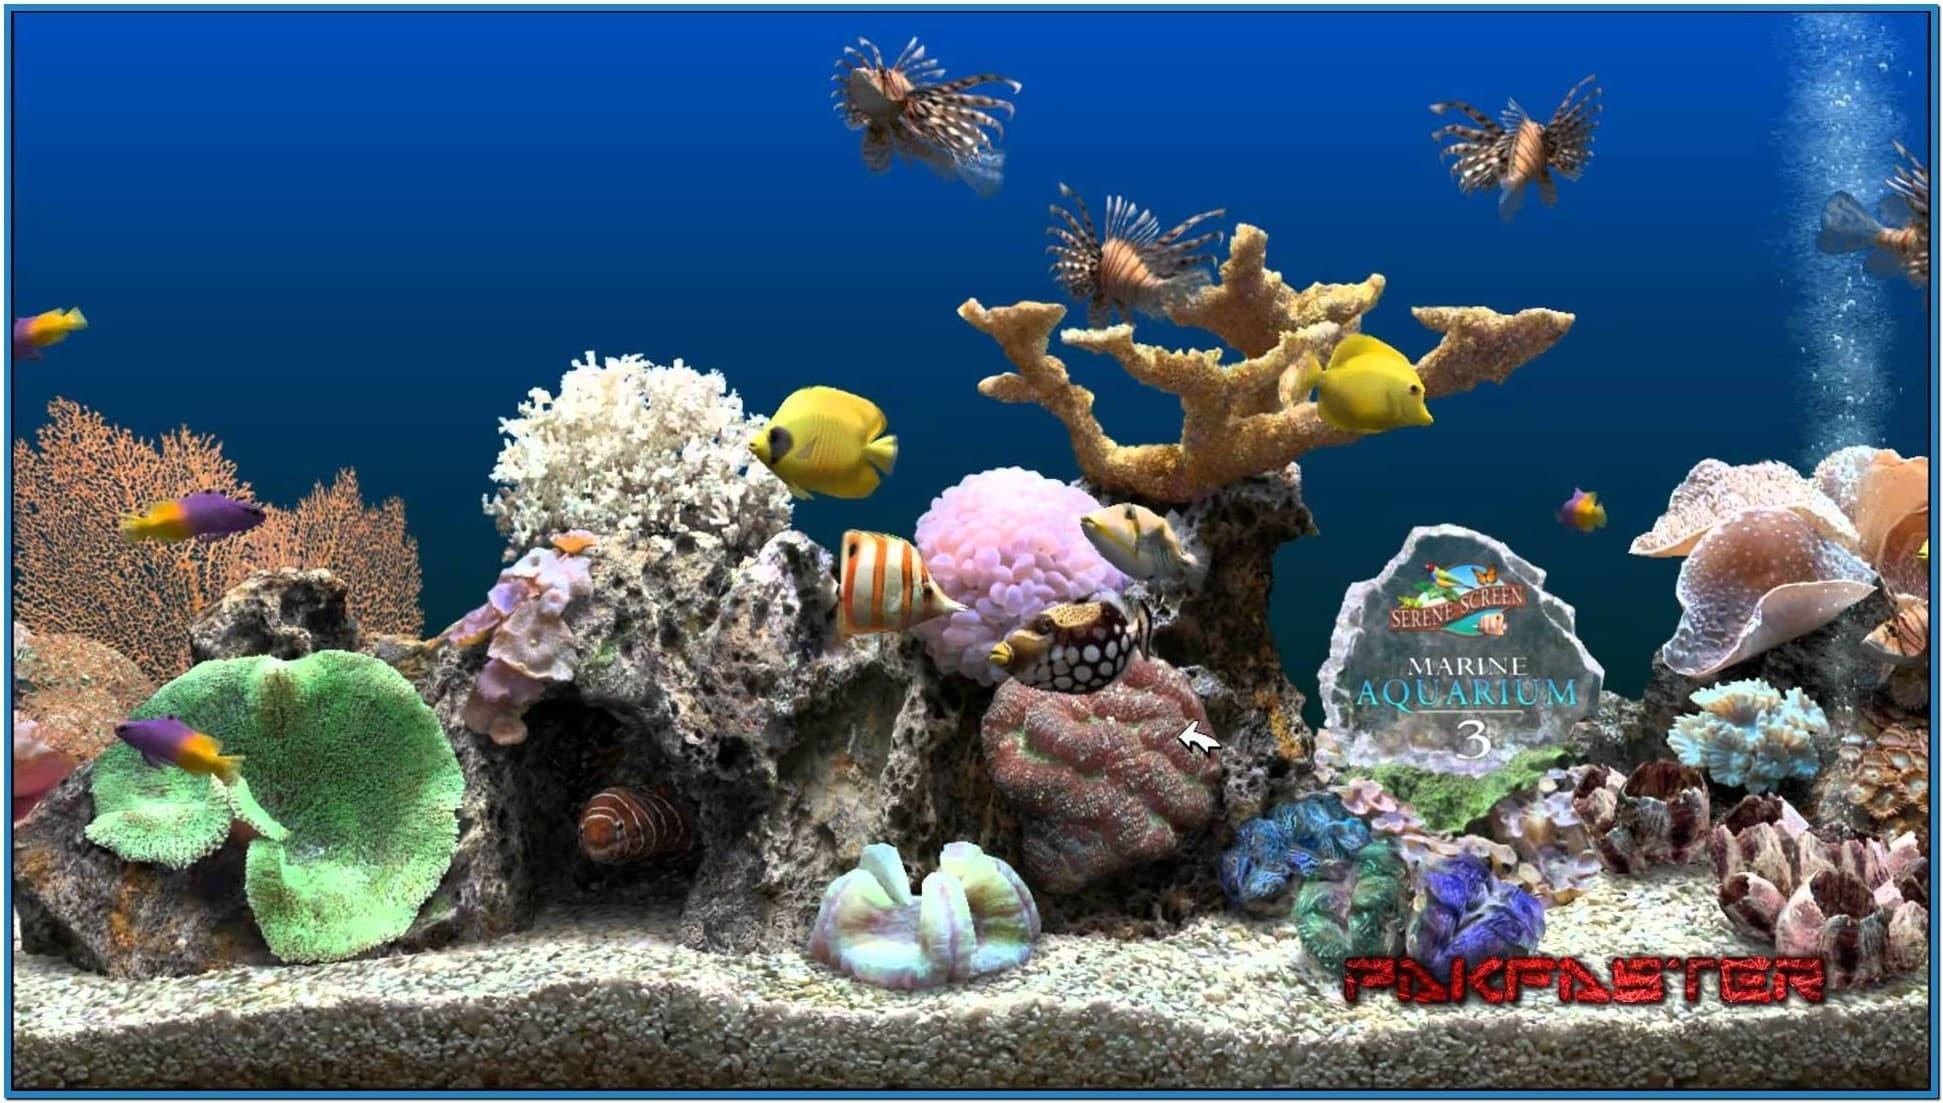 Screensaver marine aquarium deluxe 3.2 – Download free